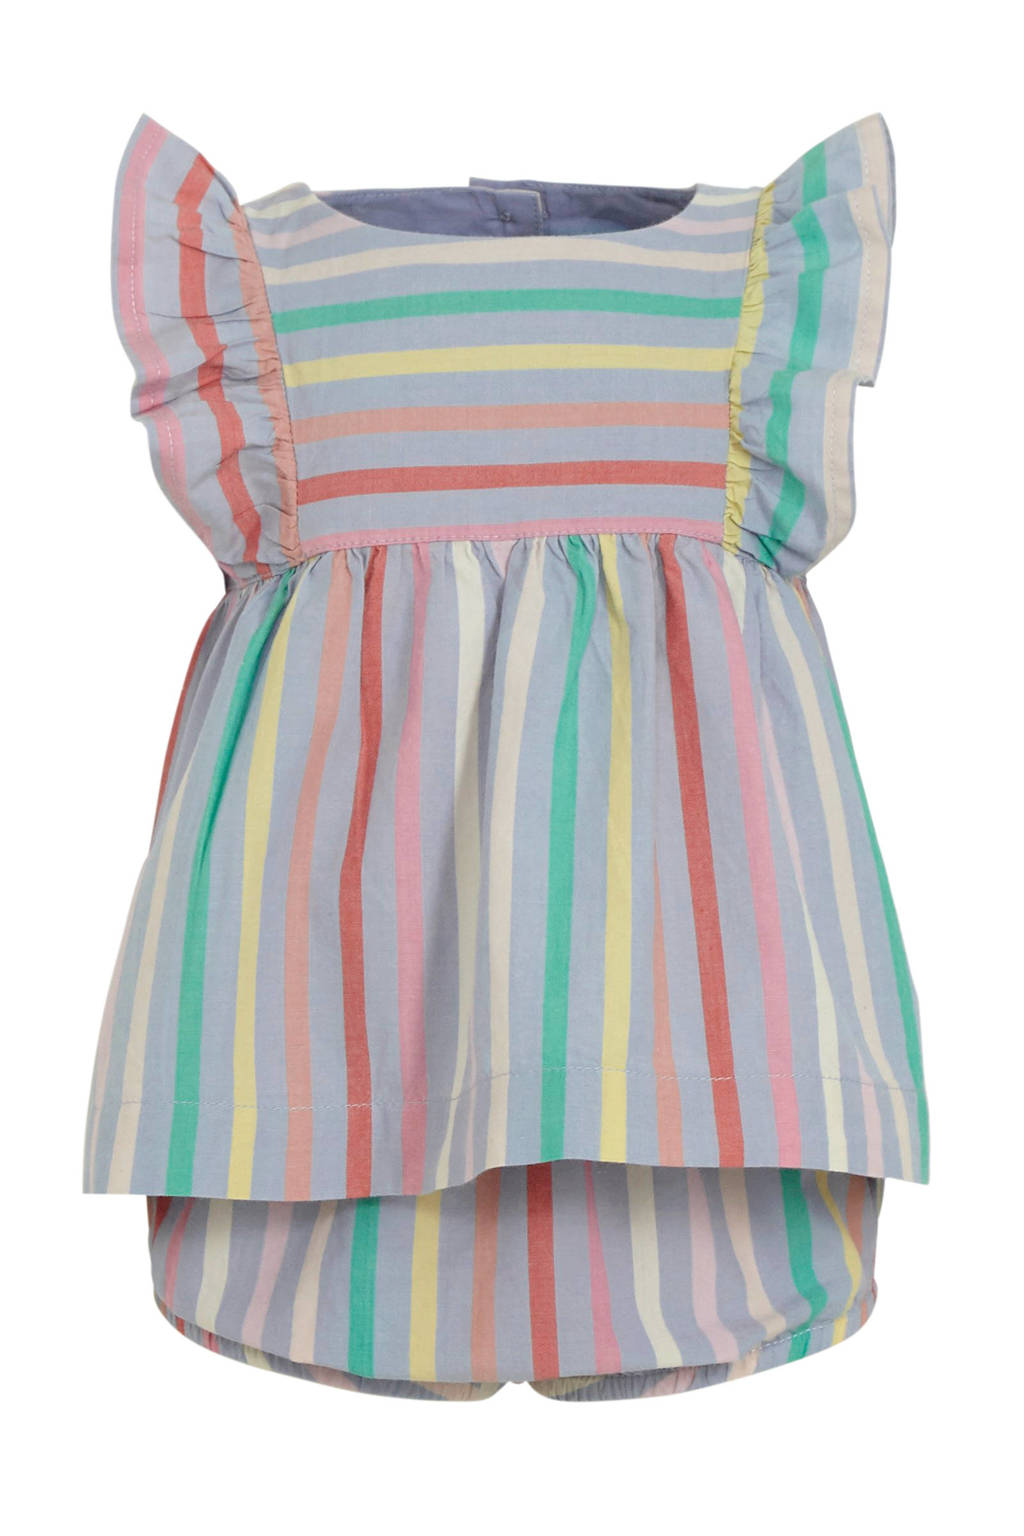 GAP gestreepte baby jurk + broek lila/multi, Lila/multi